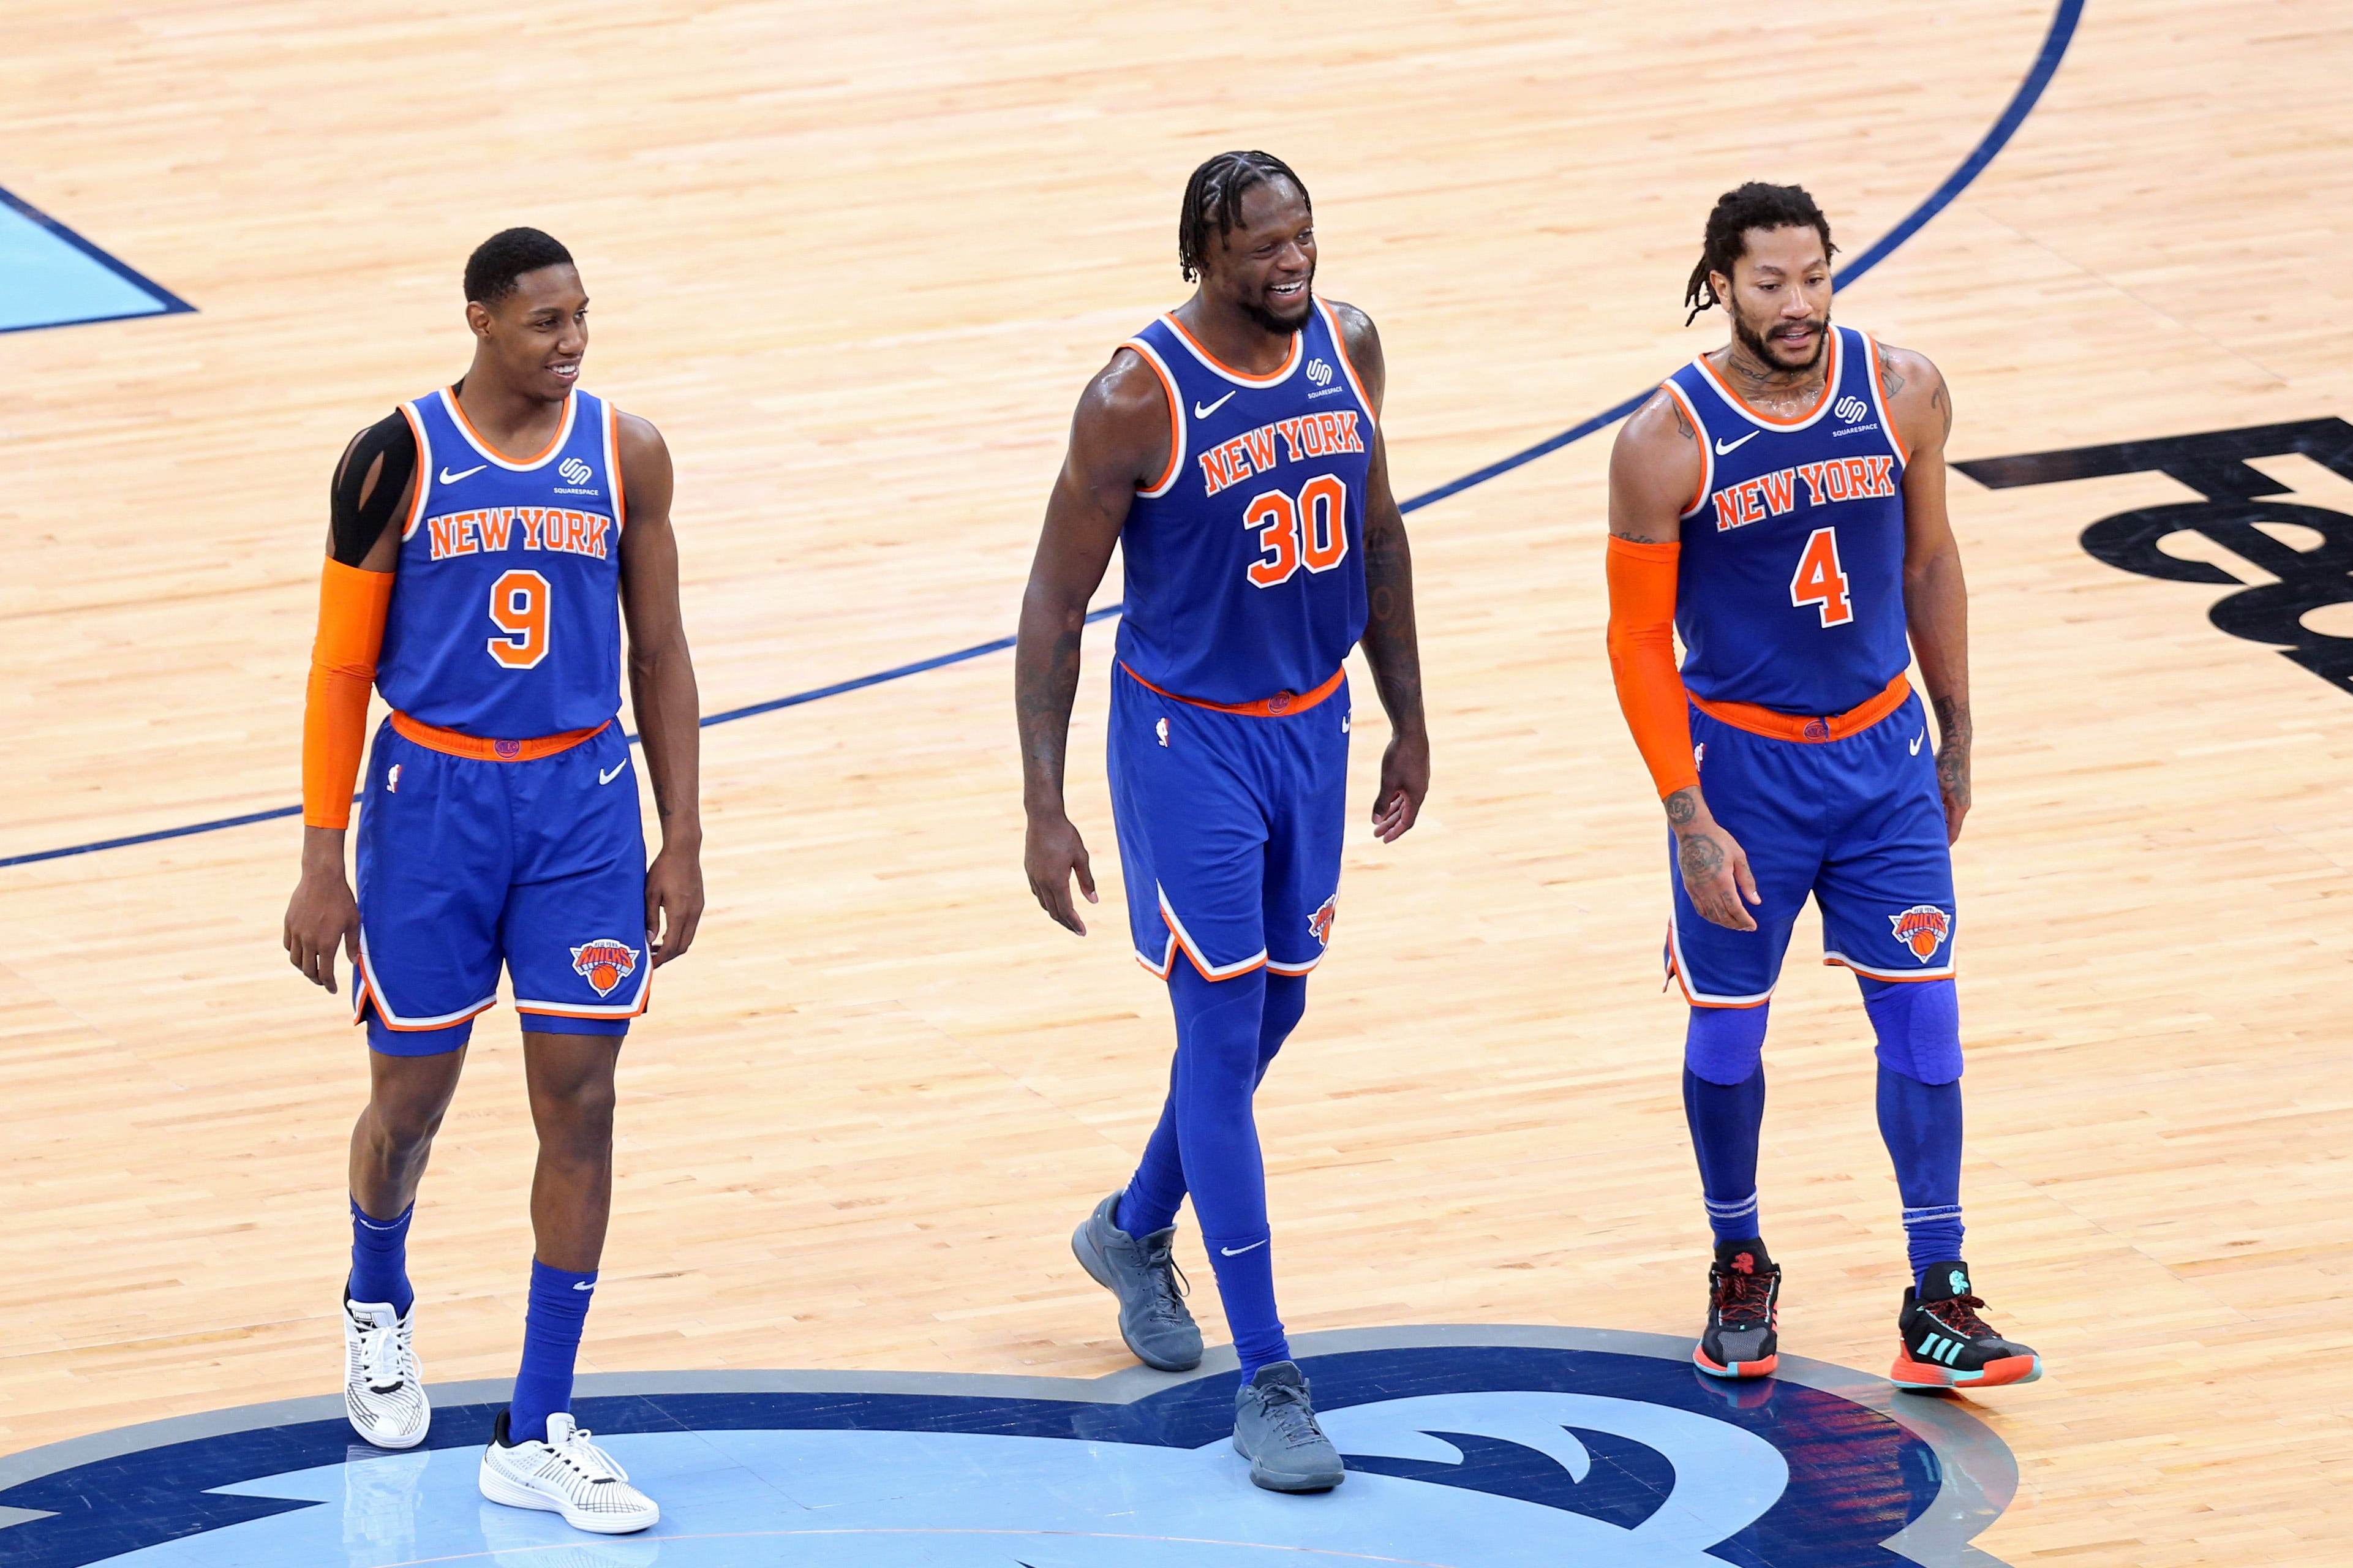 New York Knicks clinch first playoff spot since 2012-13 season with Boston Celtics  loss